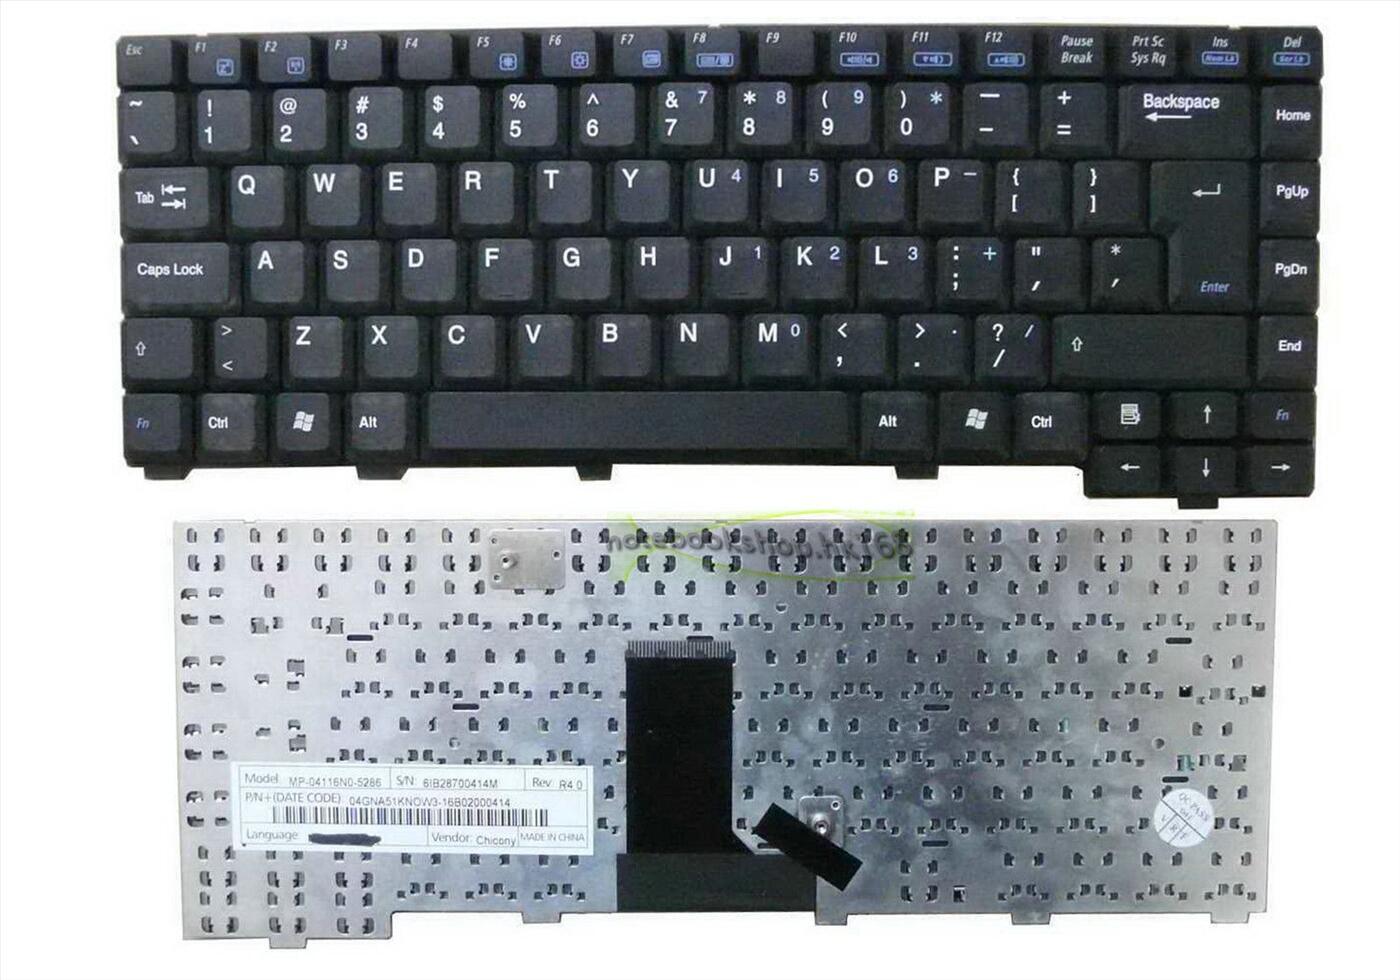 Keyboard Asus A3, A3000, A6, A6000, A9000 Series